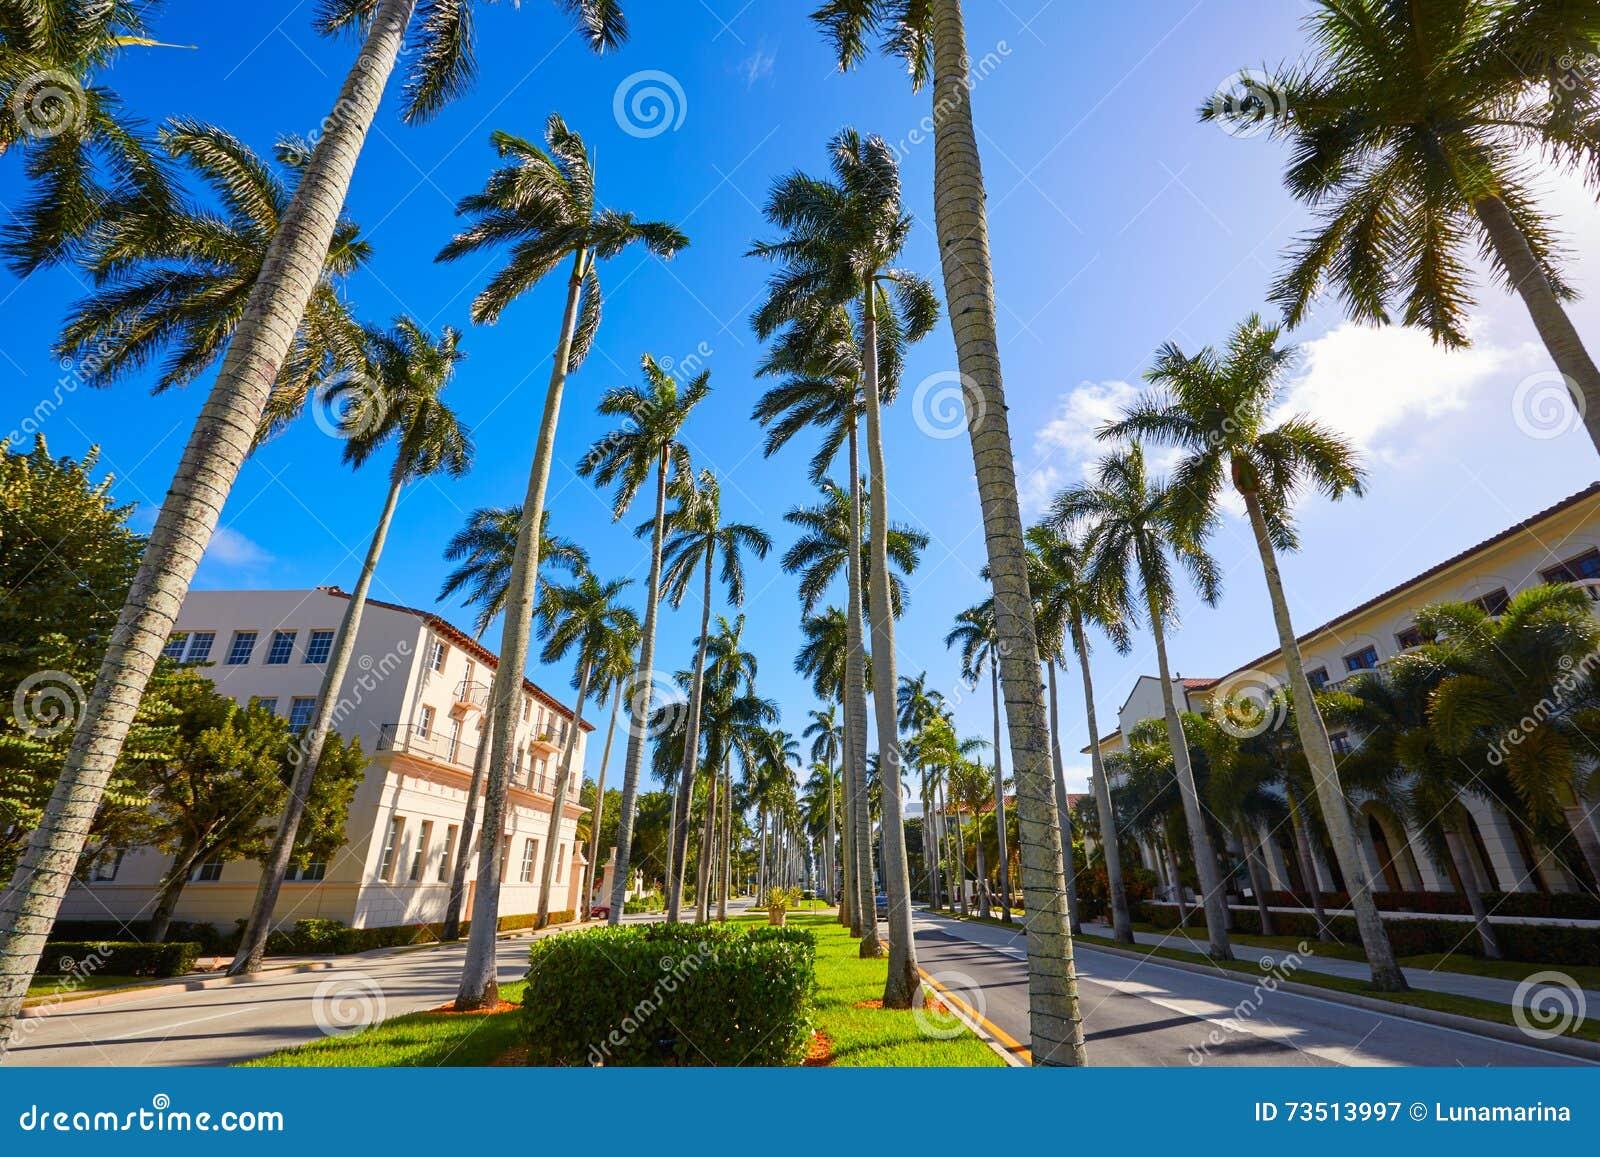 Dating royal palm beach